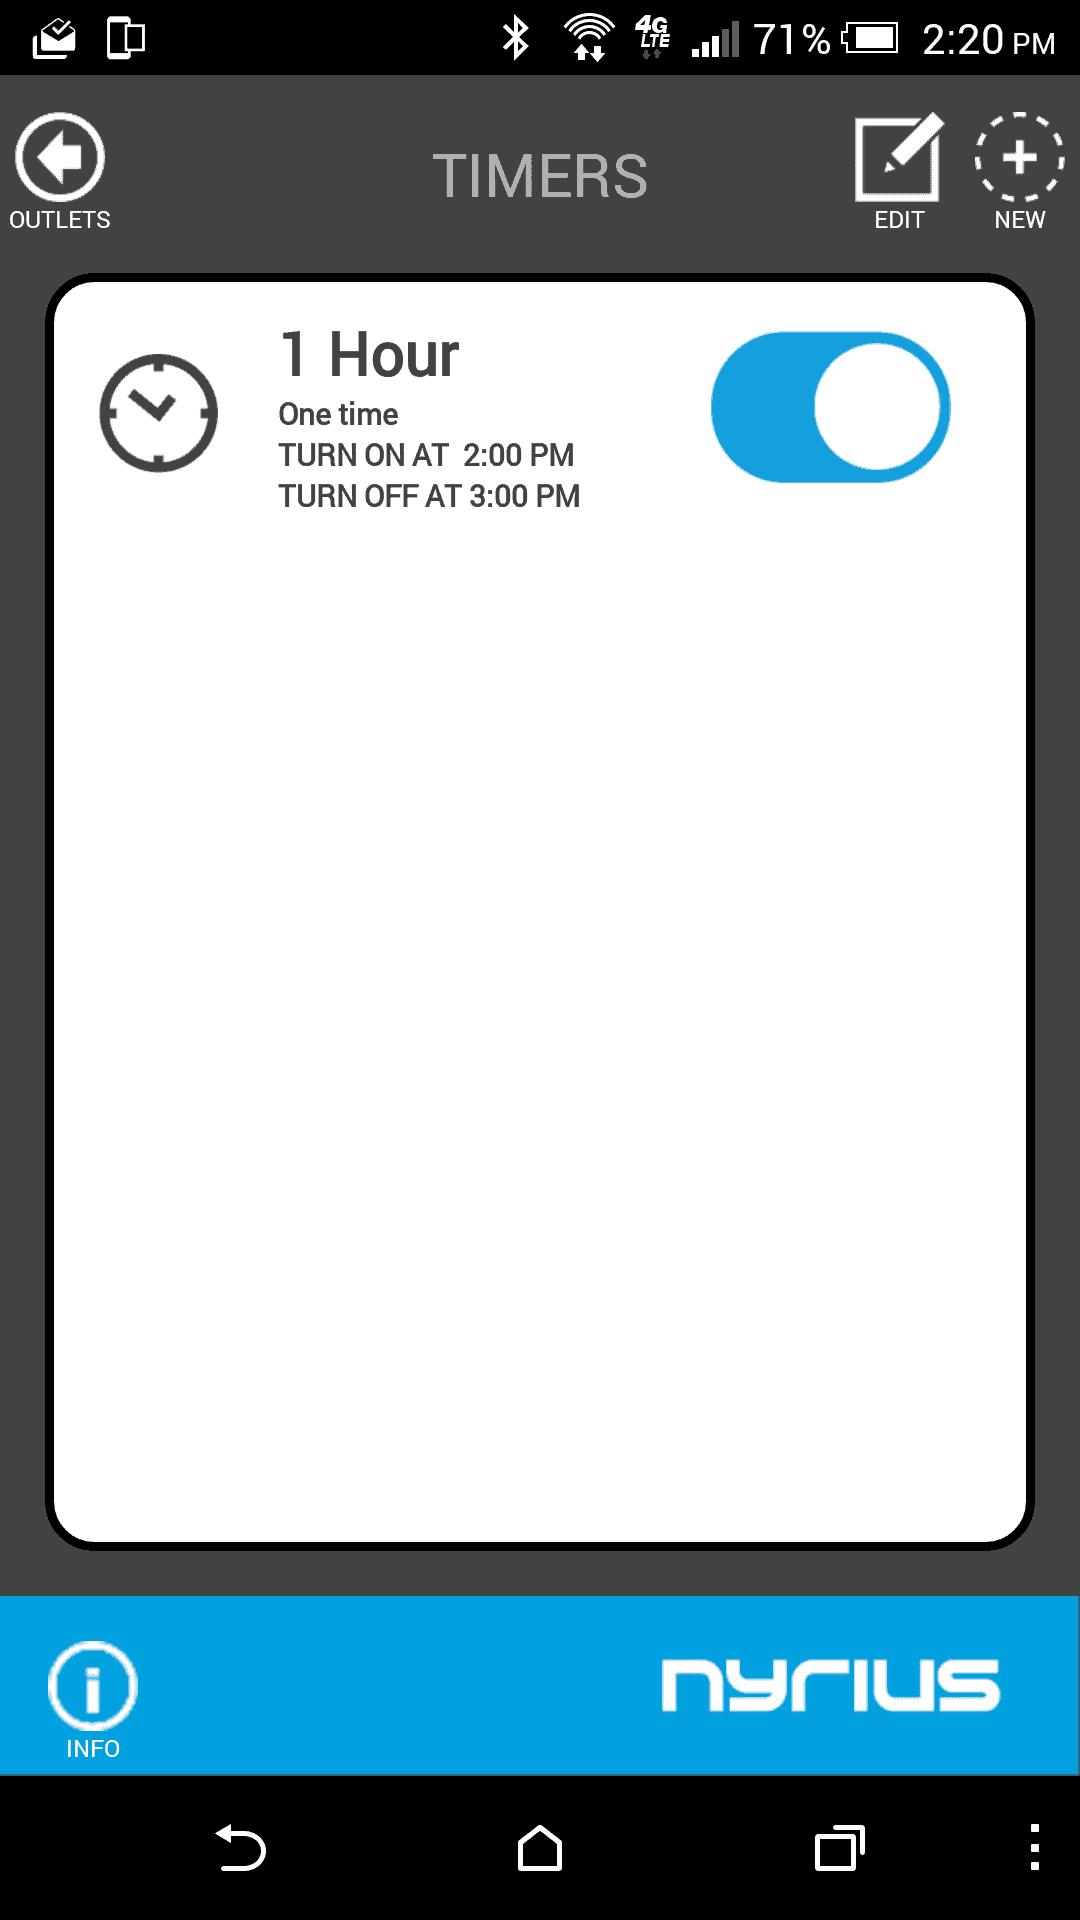 2015 03 25 18.20.04